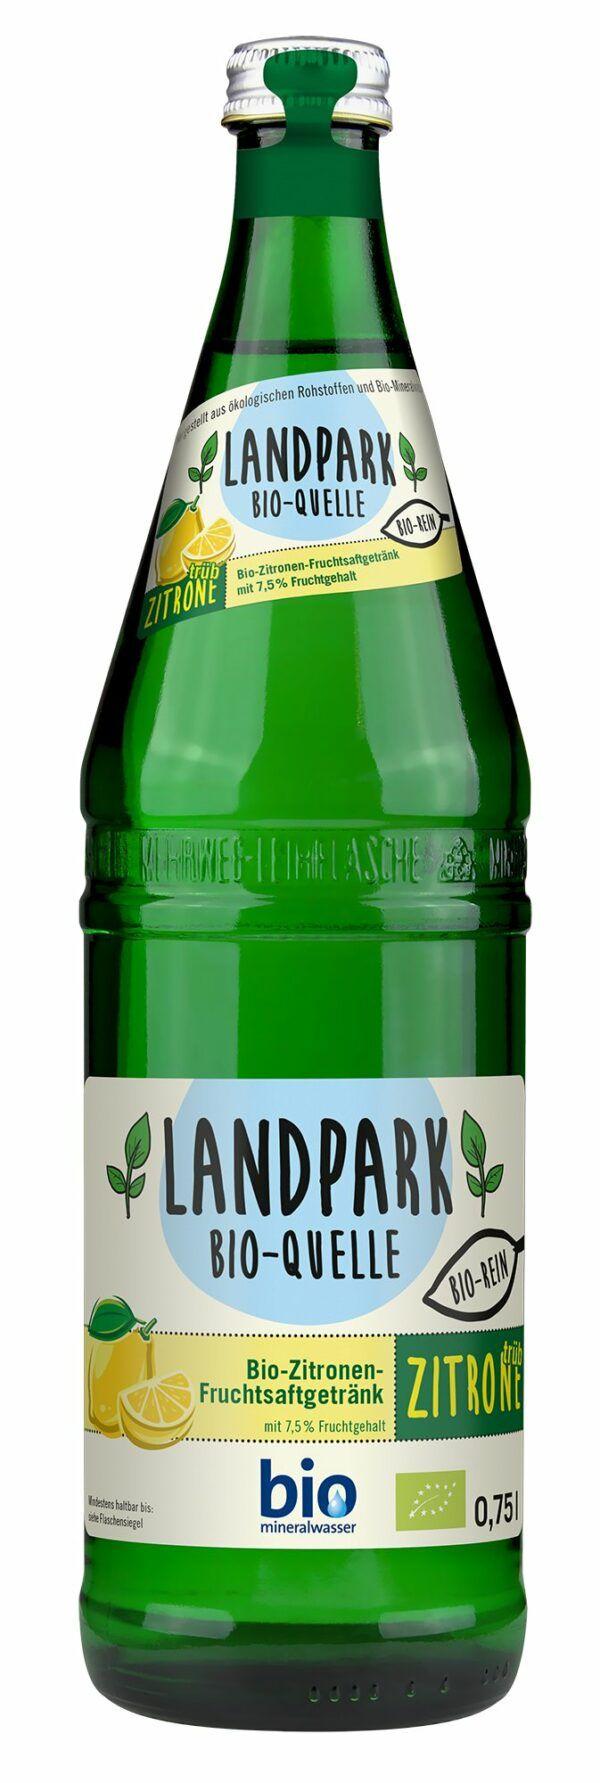 Landpark Bio-Quelle Limonade trübe Zitrone 12x0,75l